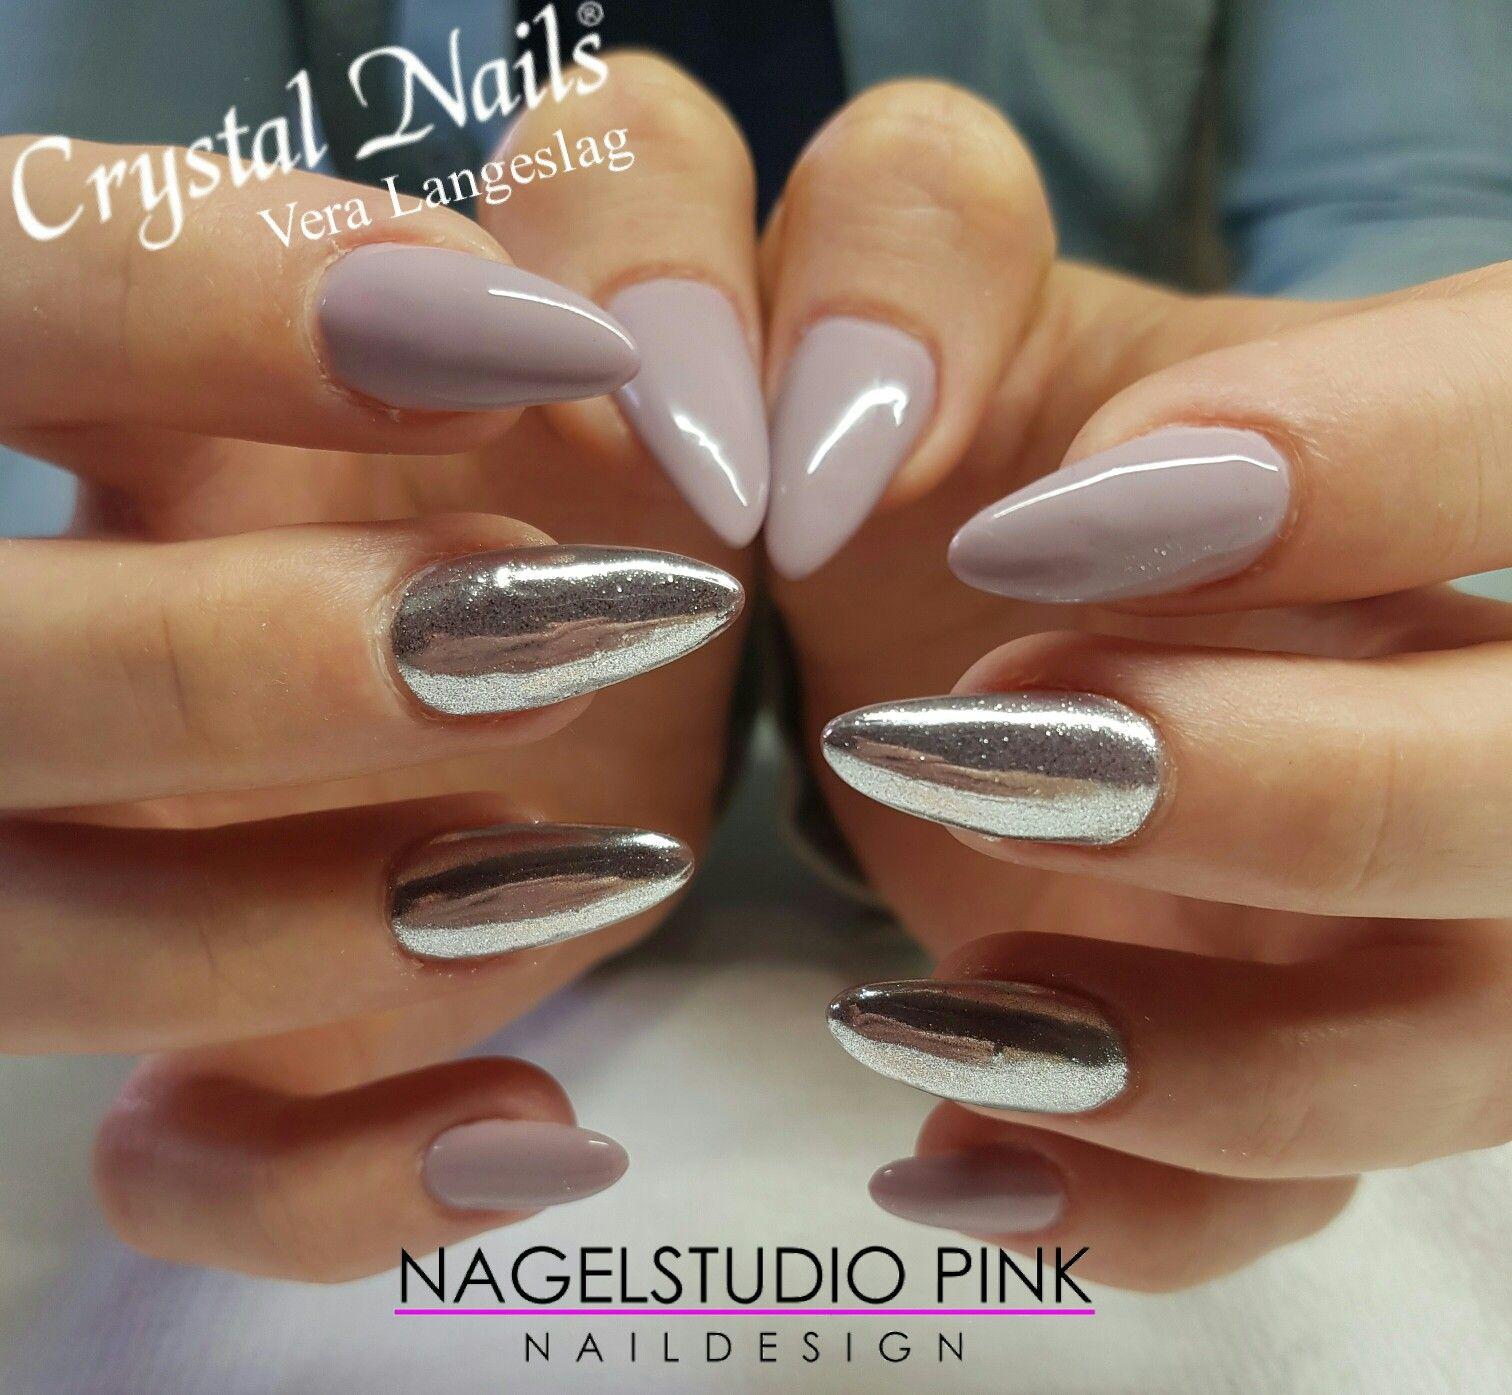 Chrome powder nail art! #crystalnails #veralangeslag ...